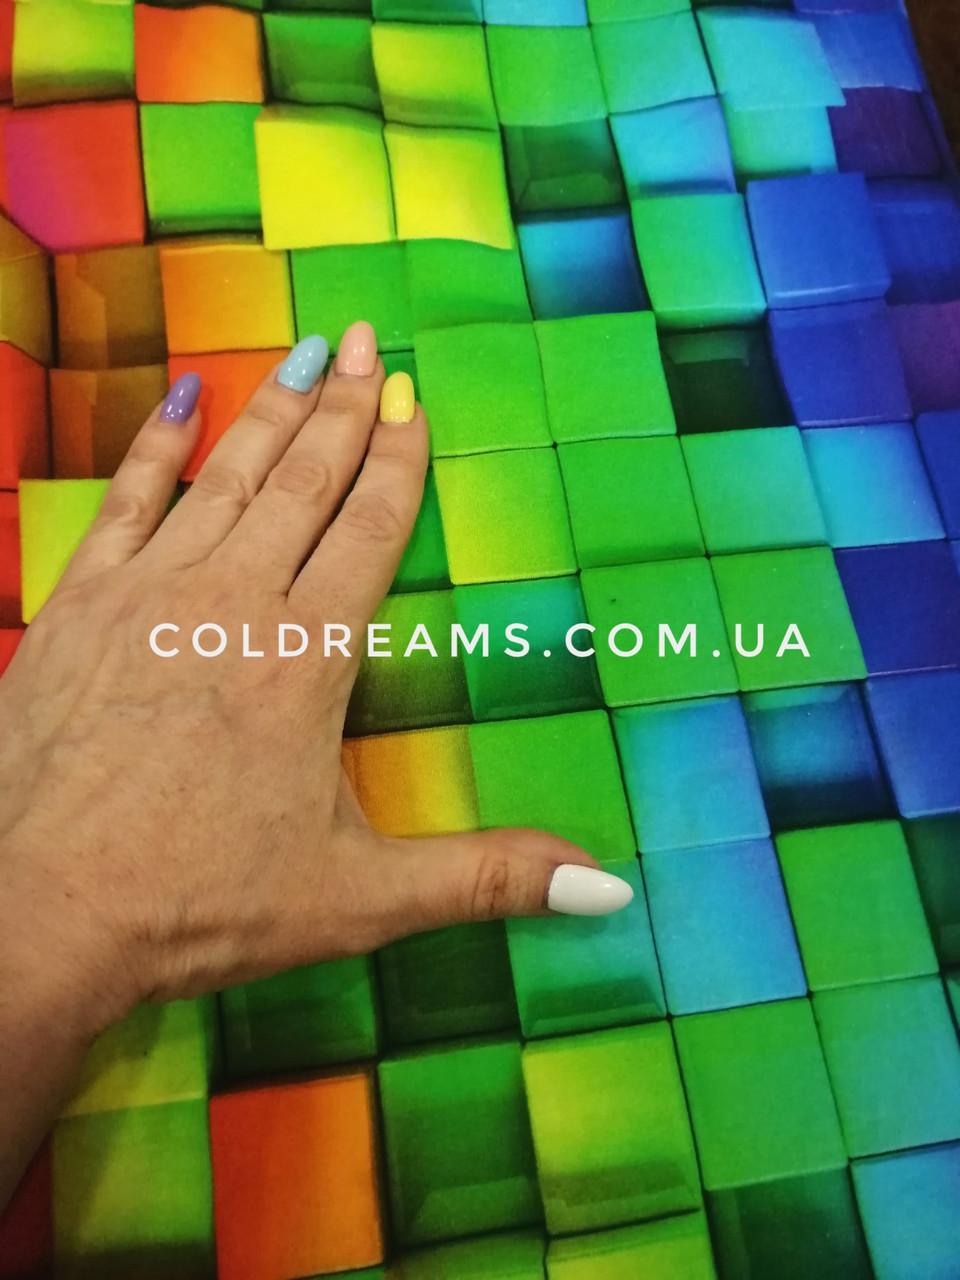 "Футер двунитка ""Цветные 3Д кубики"" - 185см. (диджитал) приход 20.05"